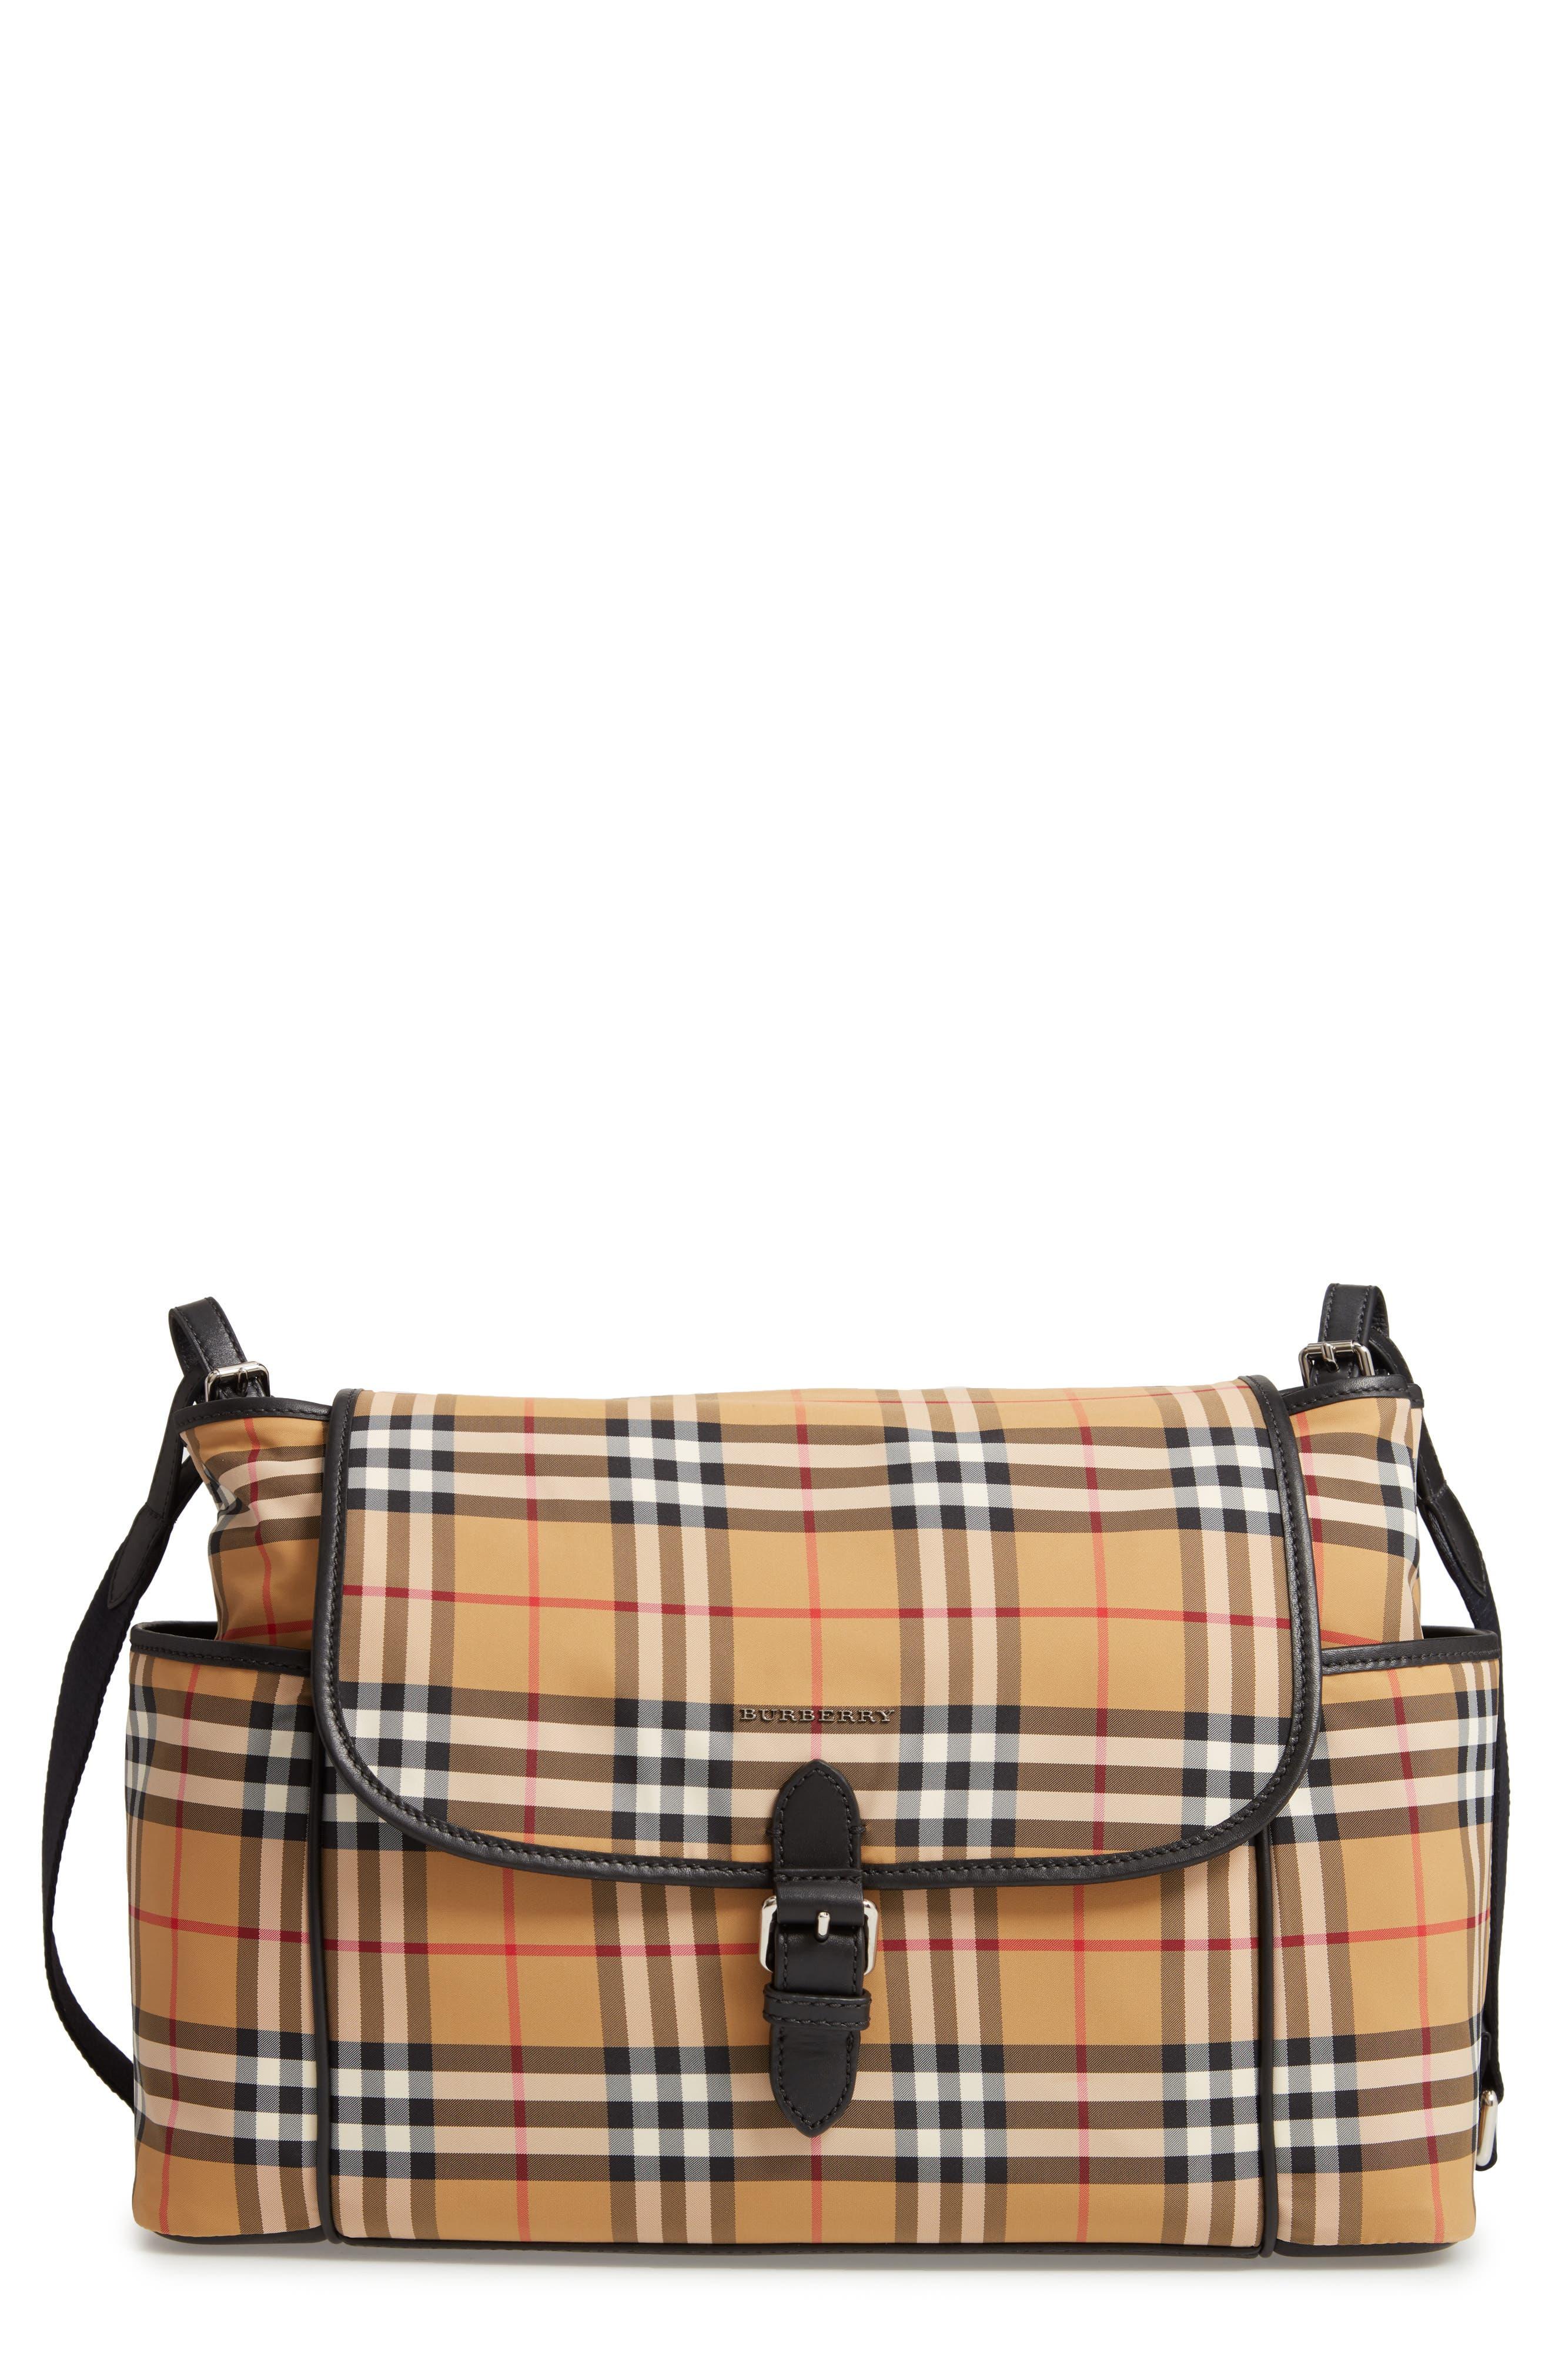 Flap Diaper Bag,                         Main,                         color, ANTIQUE YELLOW/ BLCK